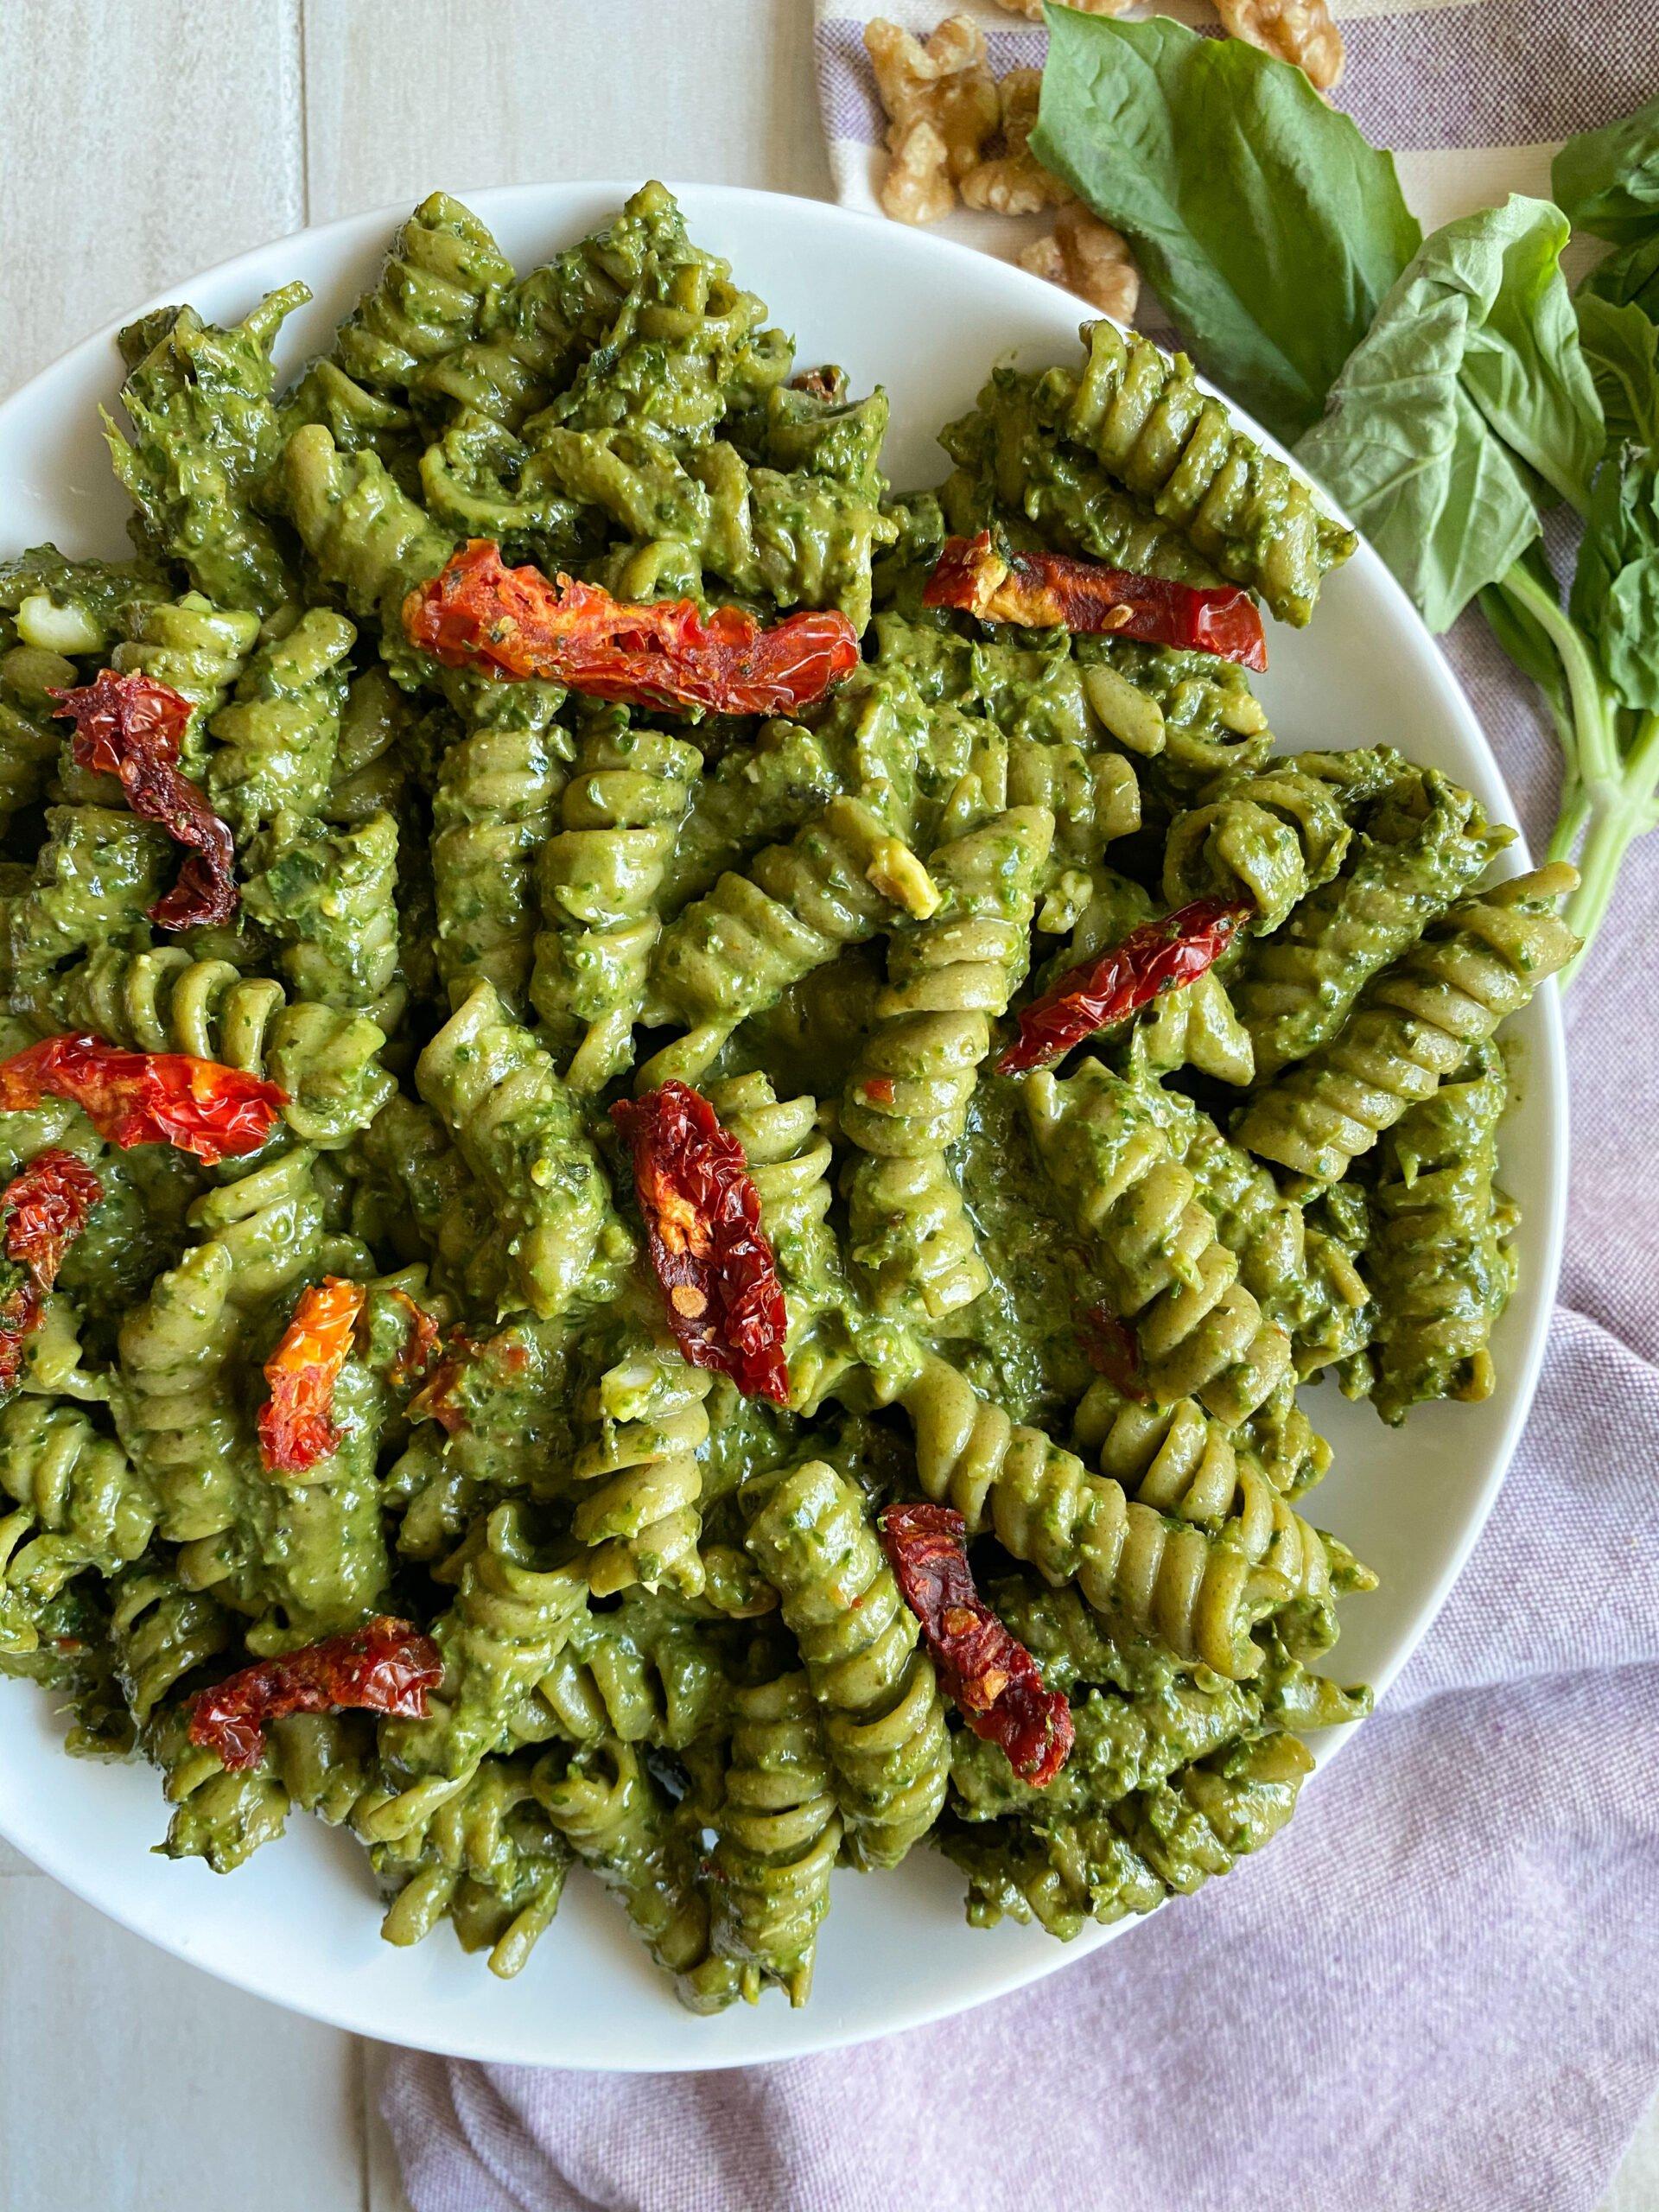 Spinach Avocado Pesto Sauce